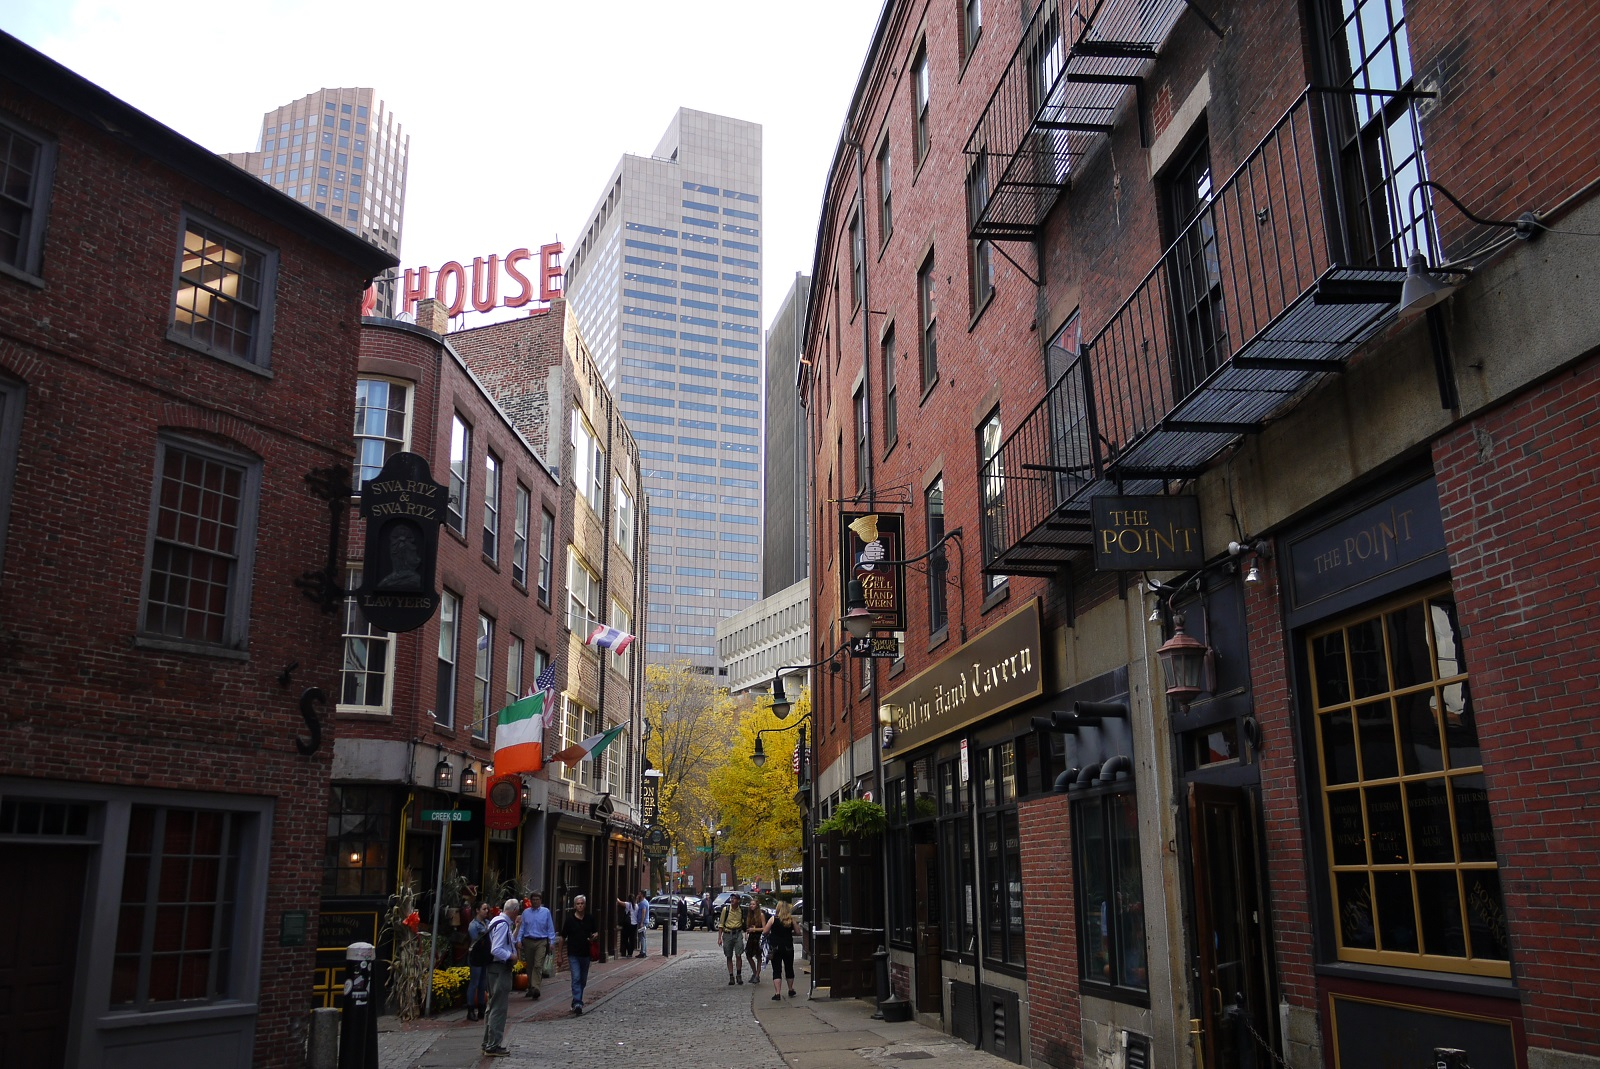 Bostons Little Italy im Stadtteil North End (c) Stefanie Nake